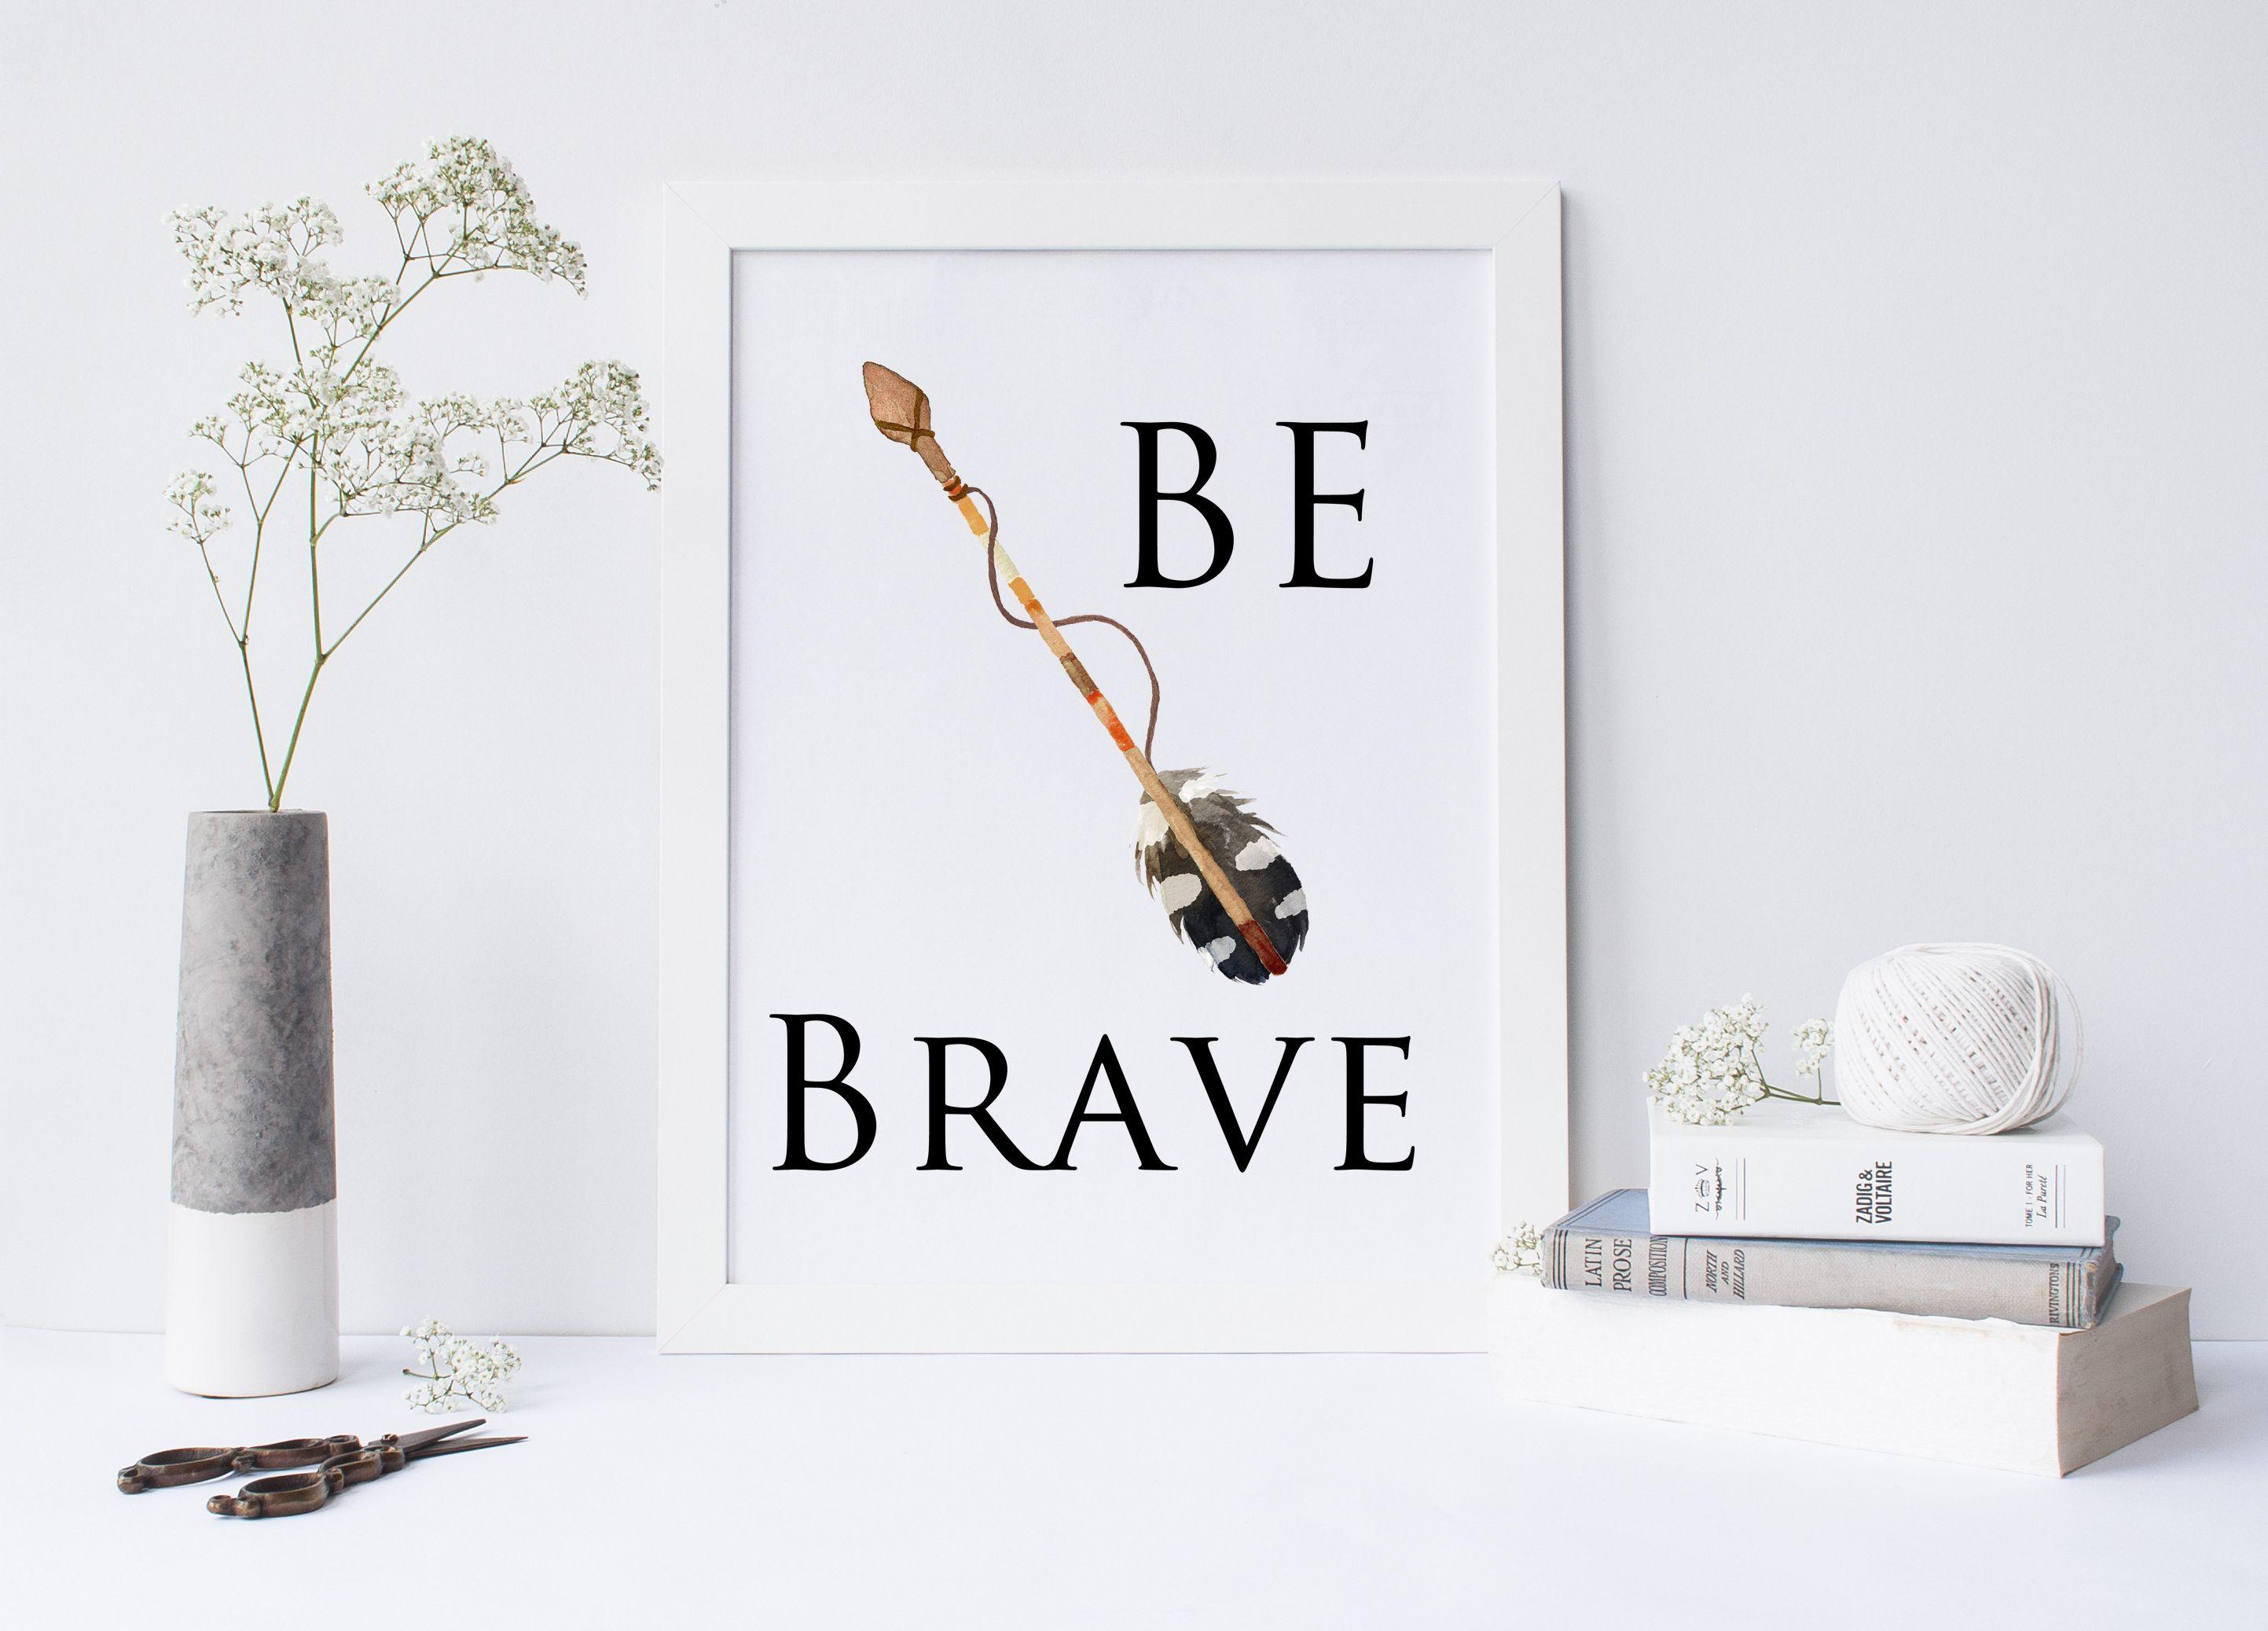 Color art tipografia - Printable Art Be Brave Typography Art Print Inspirational Quote Motivational